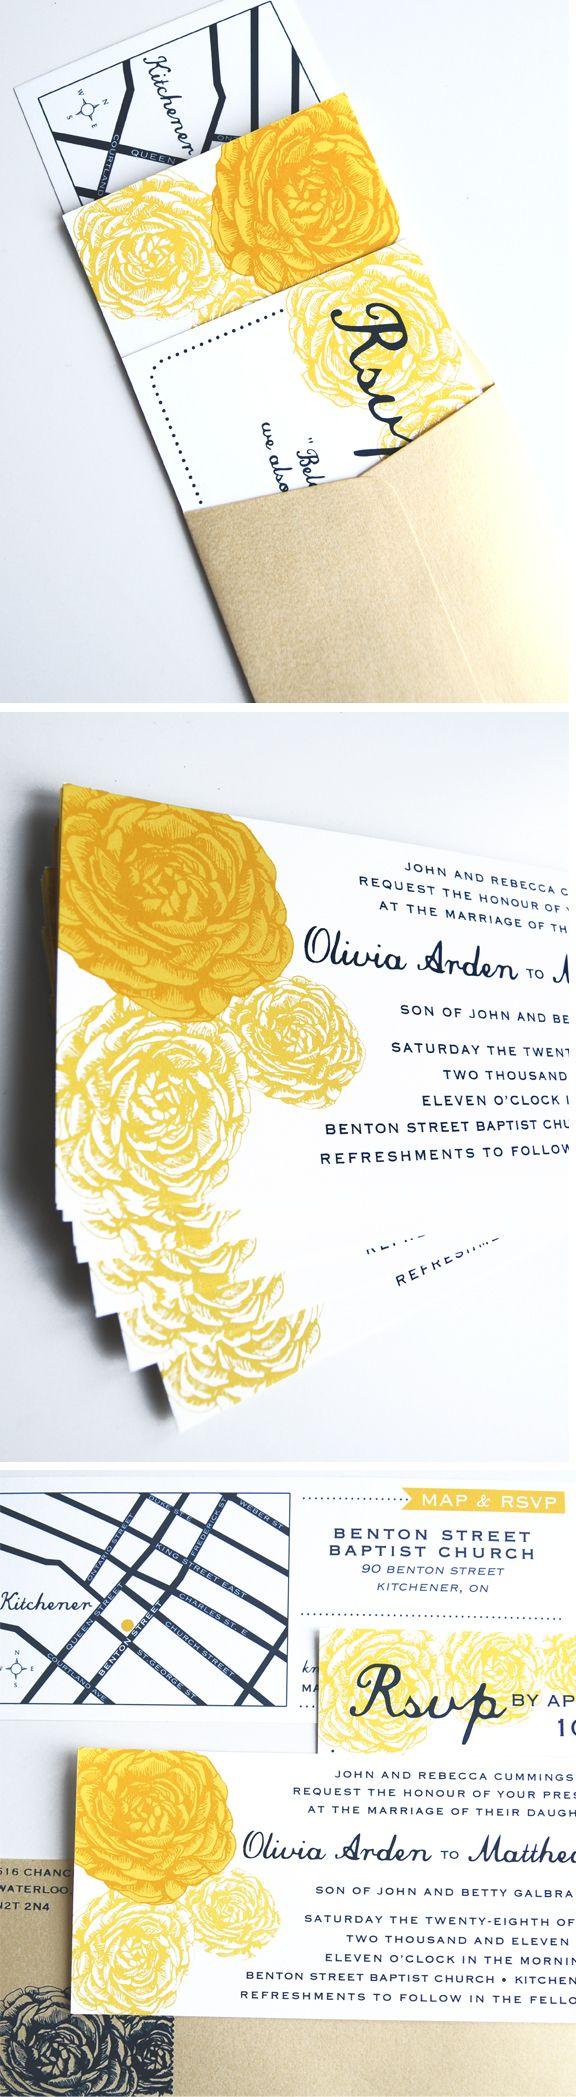 223 best My Wedding Invites images on Pinterest | Weddings ...